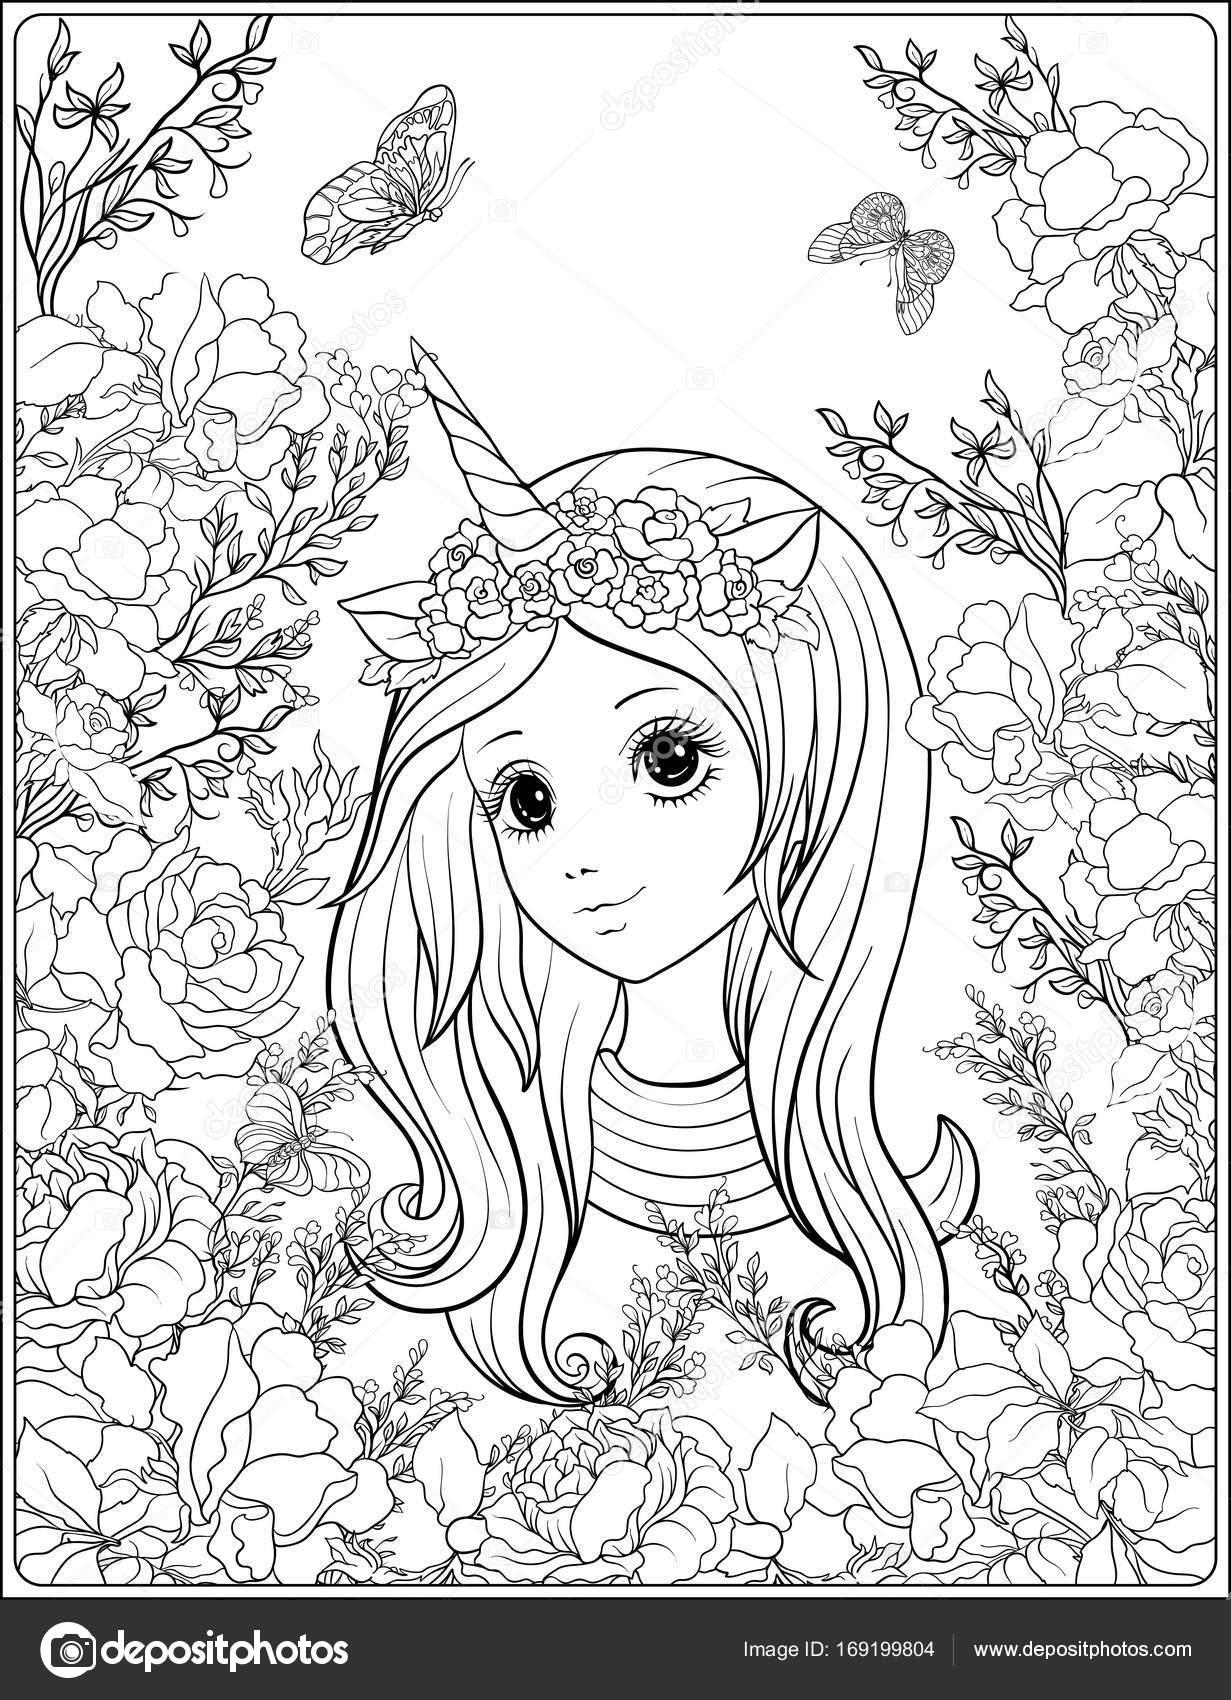 Imágenes Unicornios Animados Kawaii Para Colorear Chica Joven En